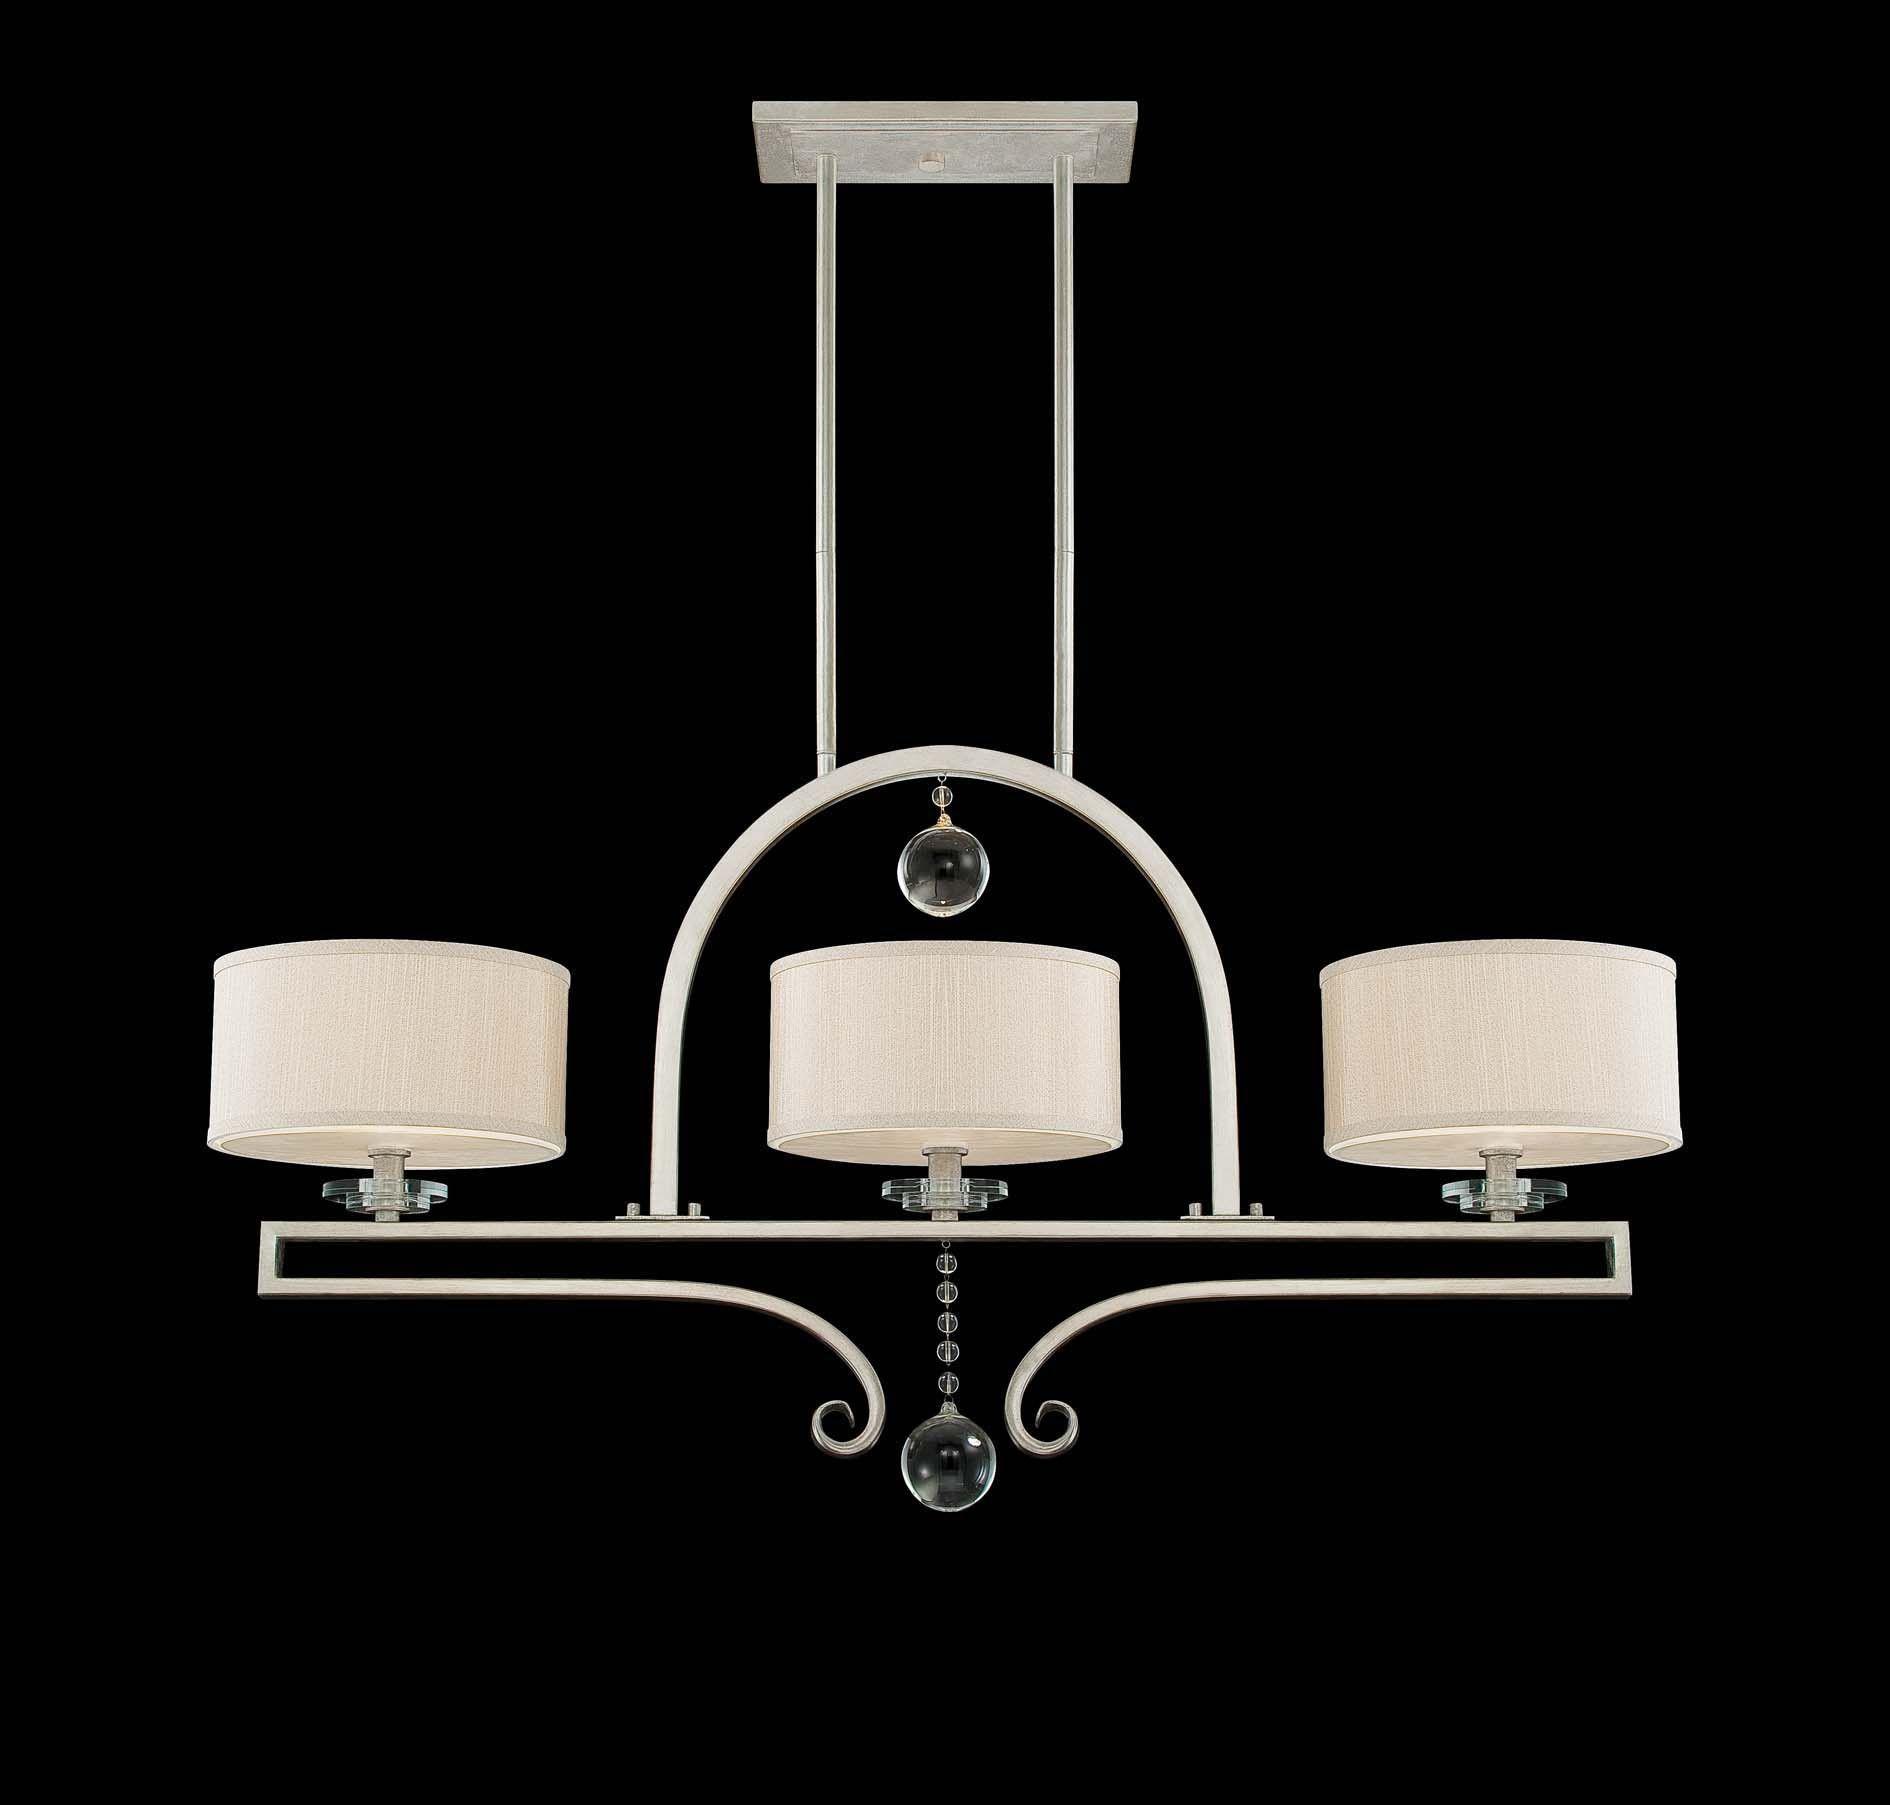 Savoy Rosendal 3 Light Linear Chandelier